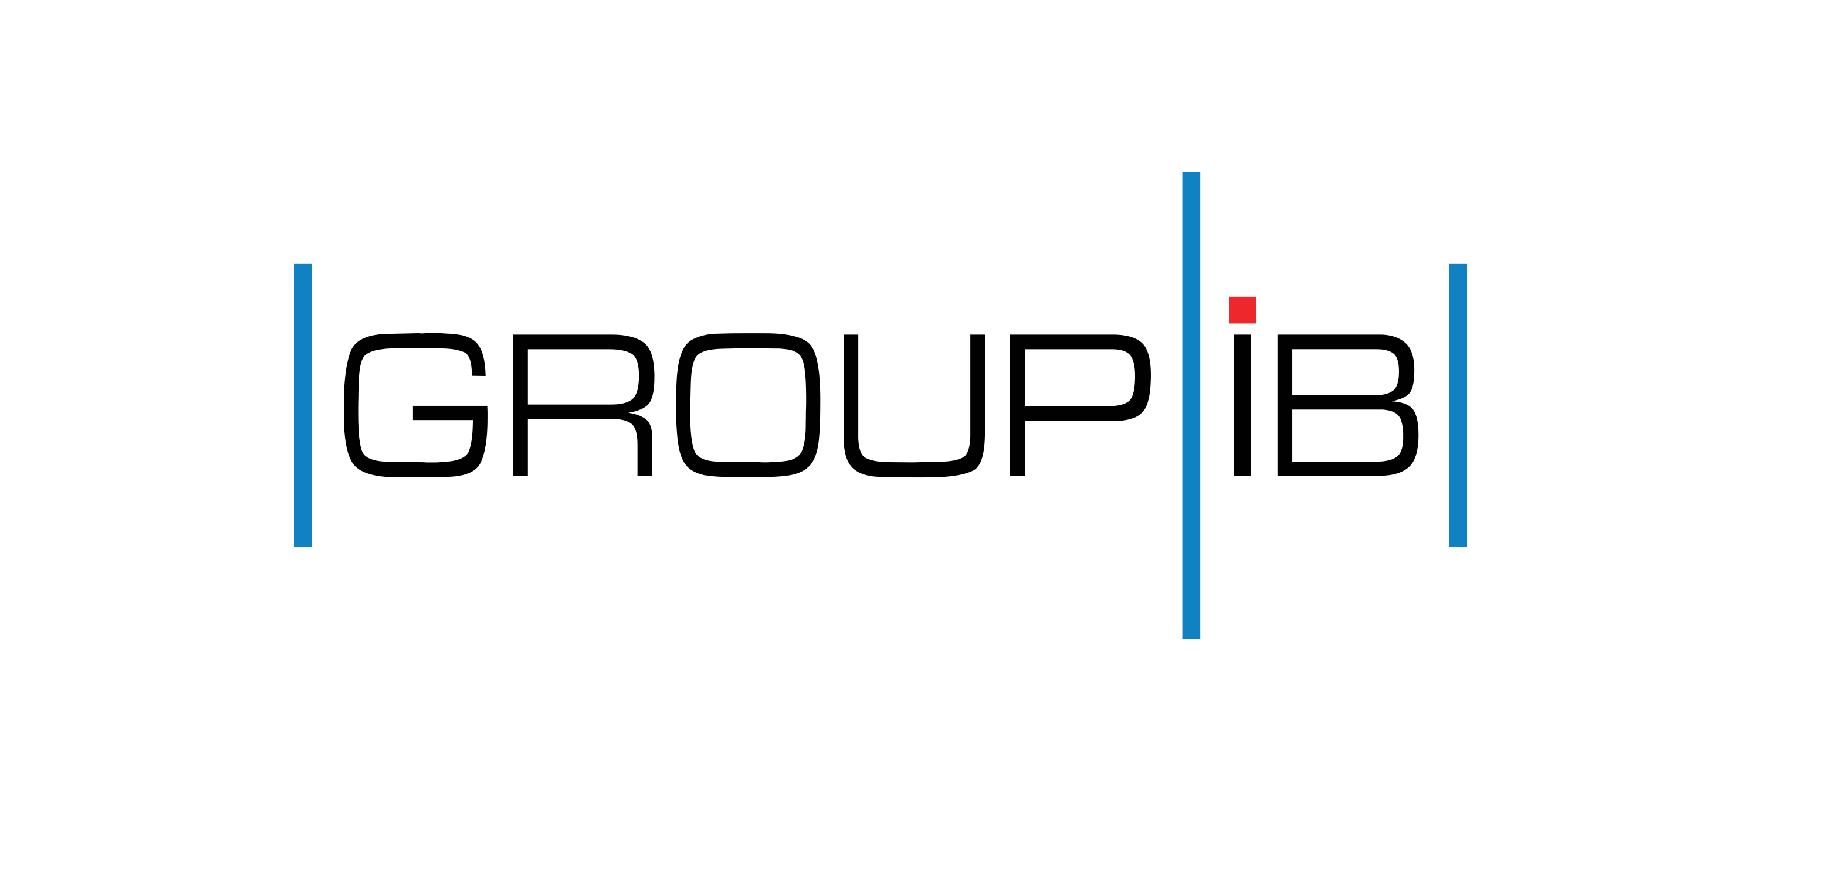 Group-IB и РОТЕК объявили о сотрудничестве для защиты ОКИИ от технологических рисков и киберугроз